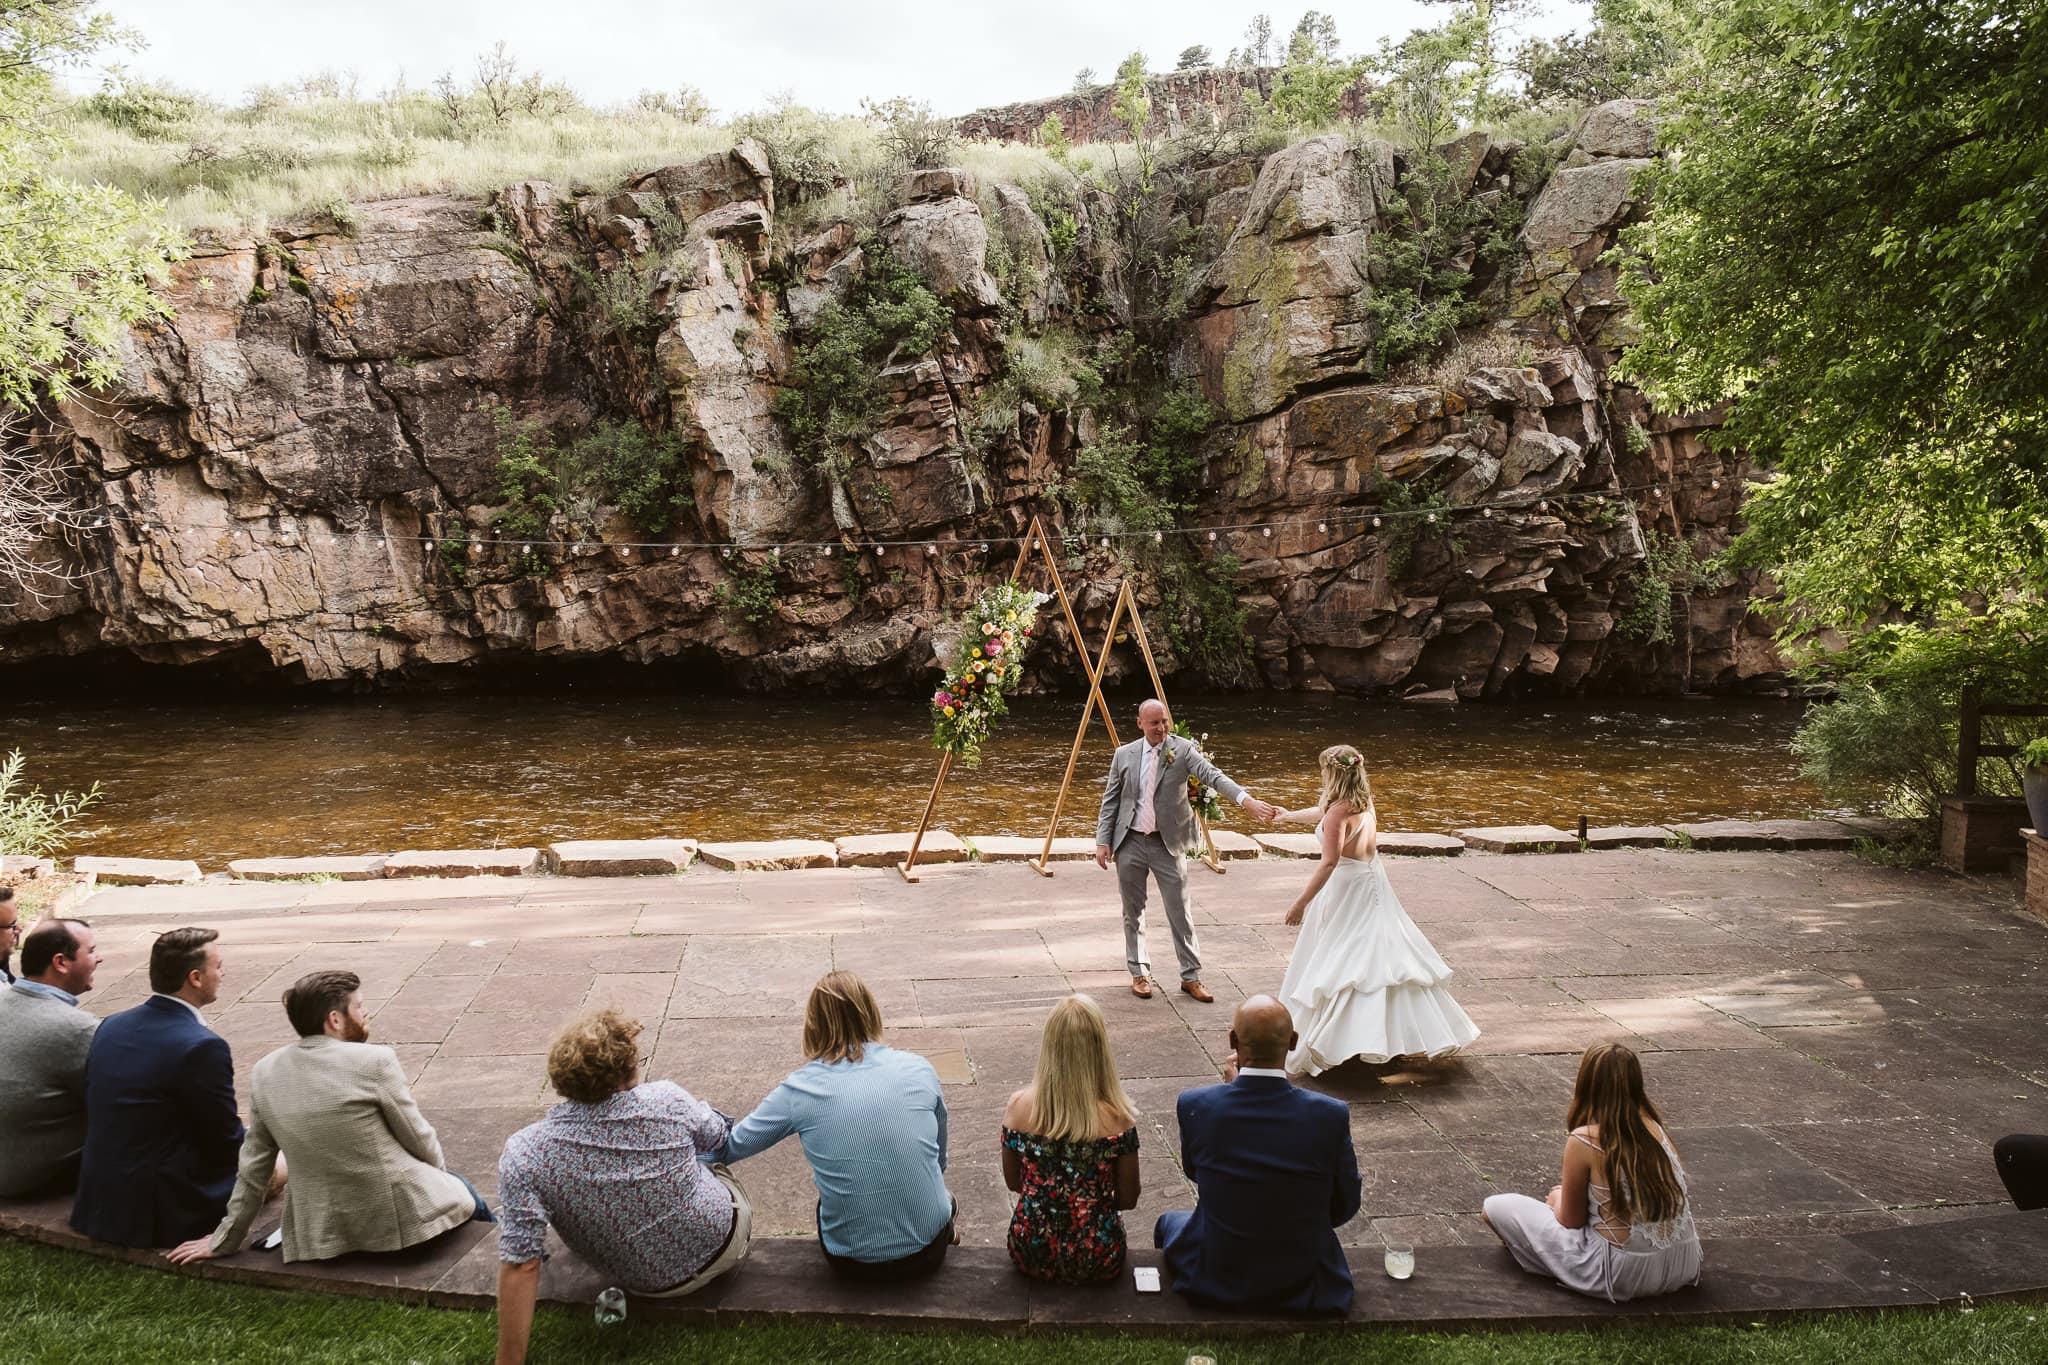 River Bend wedding venue in Lyons, CO